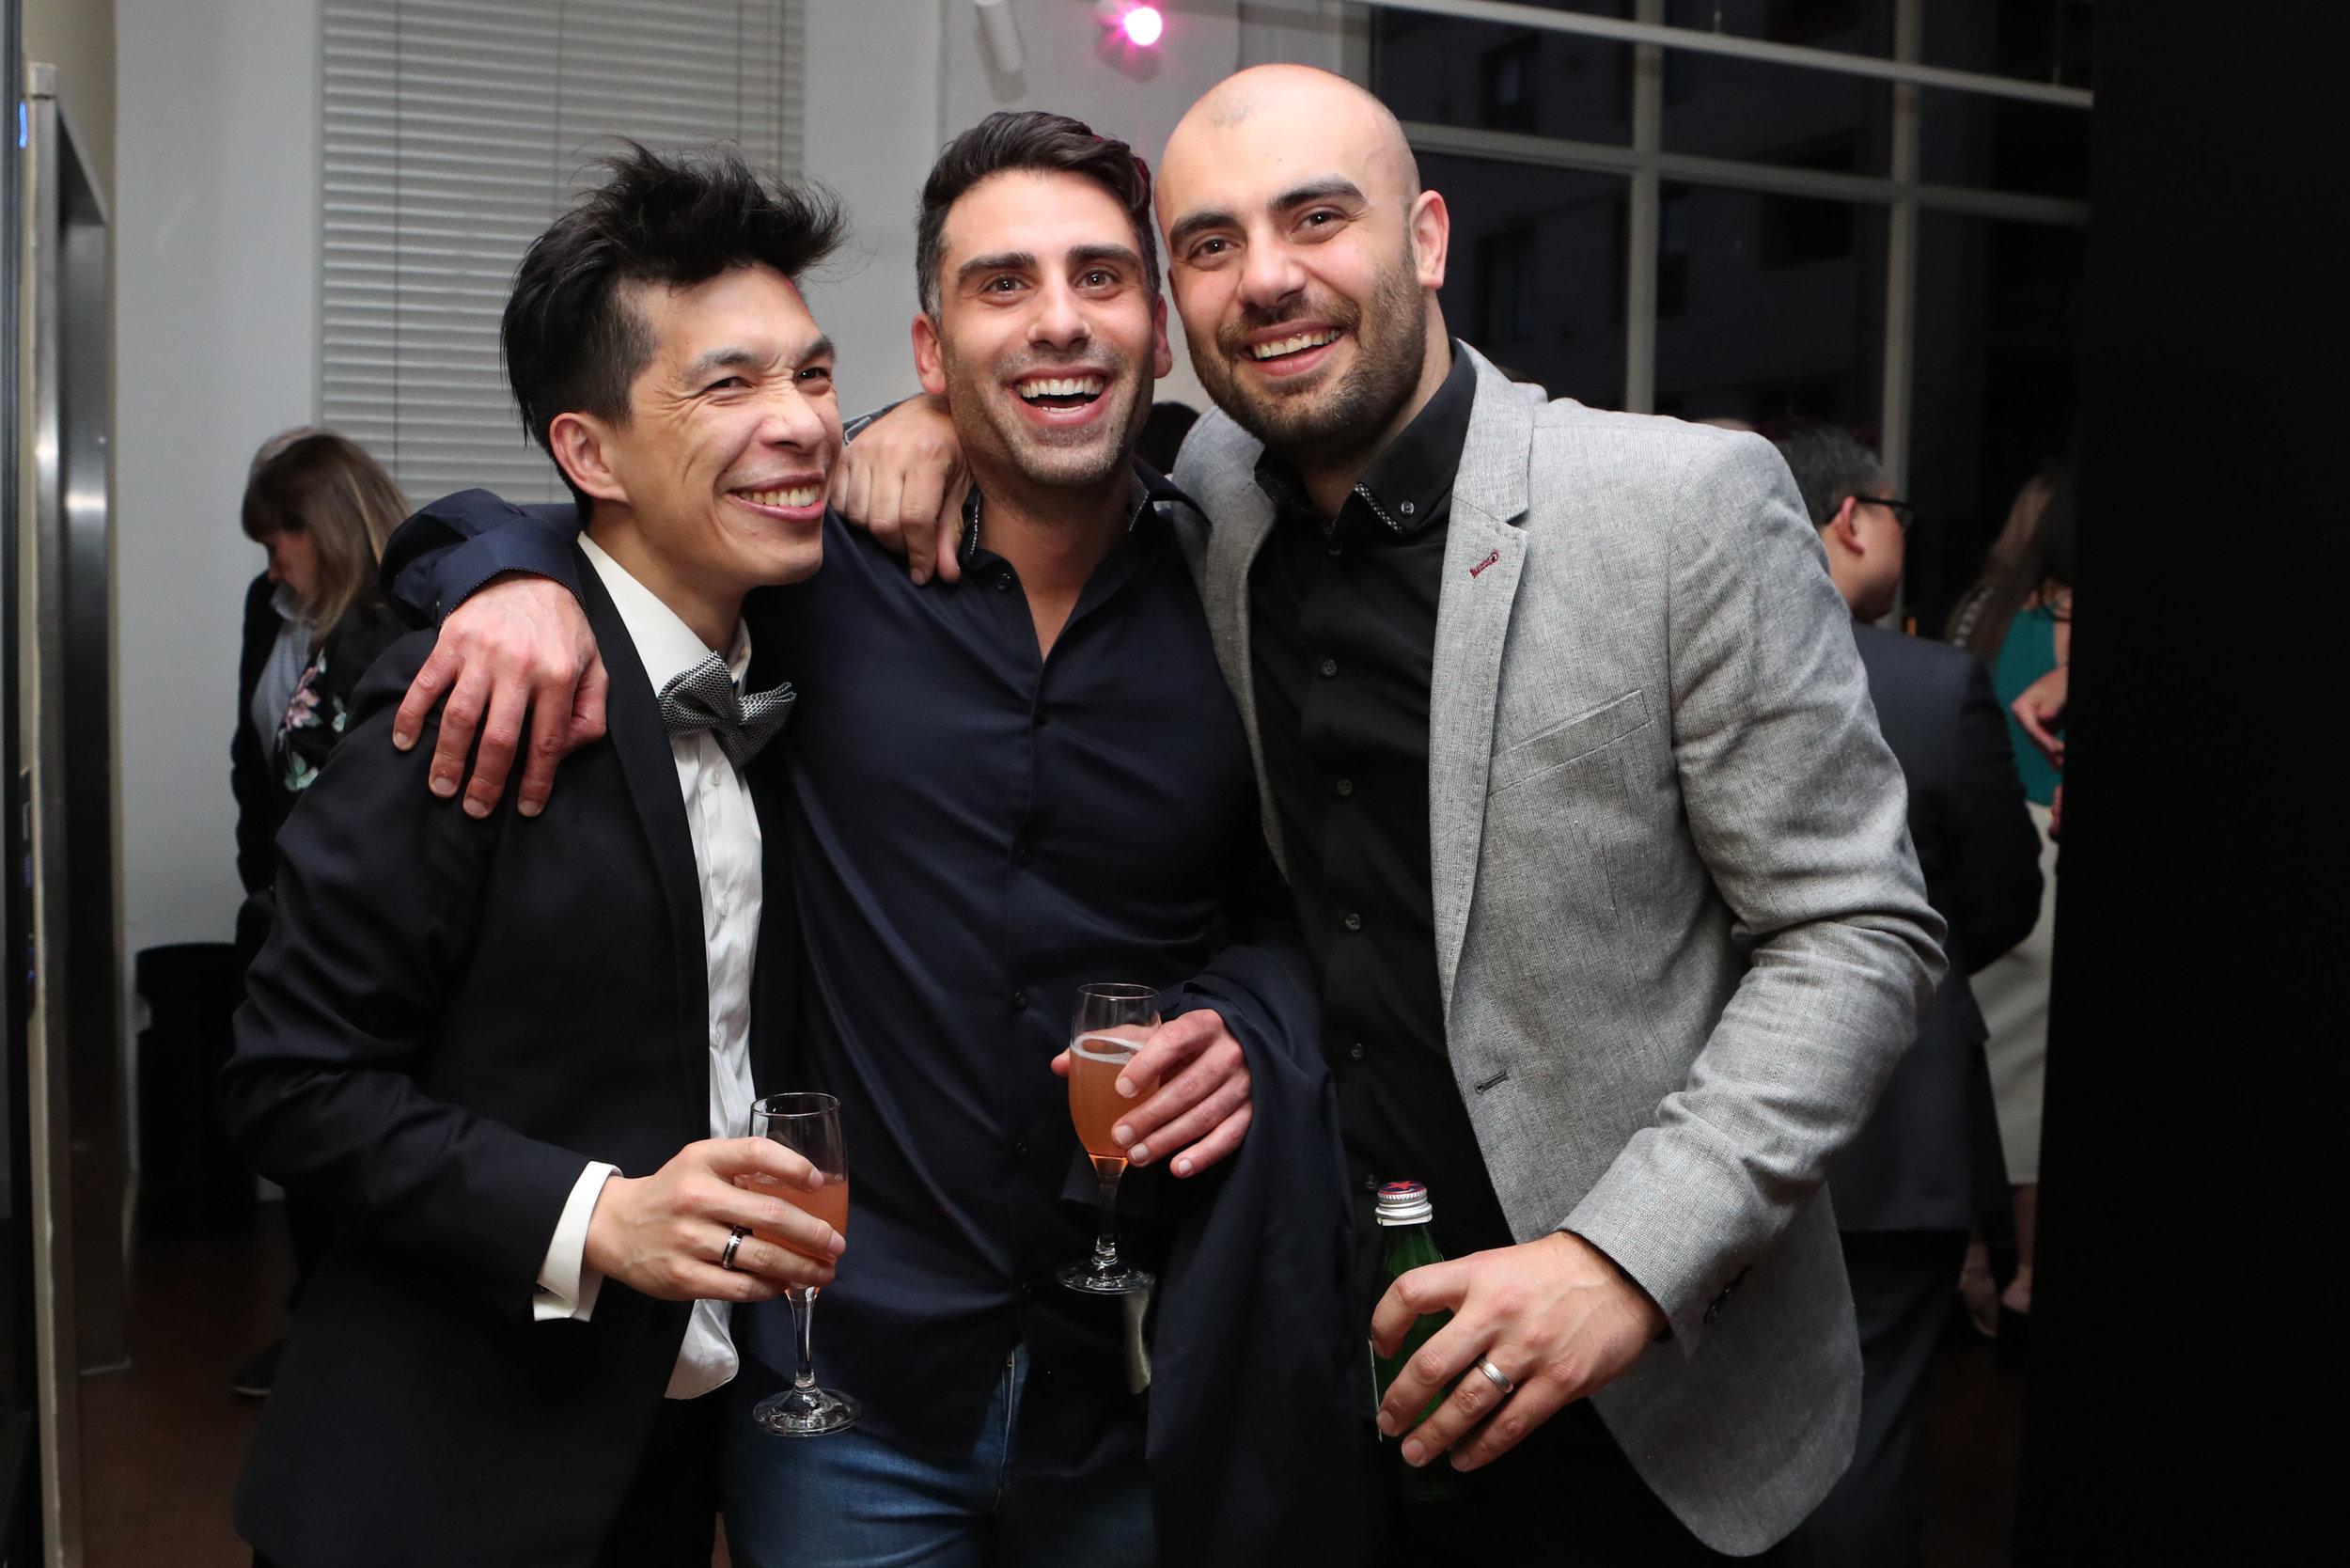 Fei Chau, Paul Greco and Merim Osmanovic(1).jpg